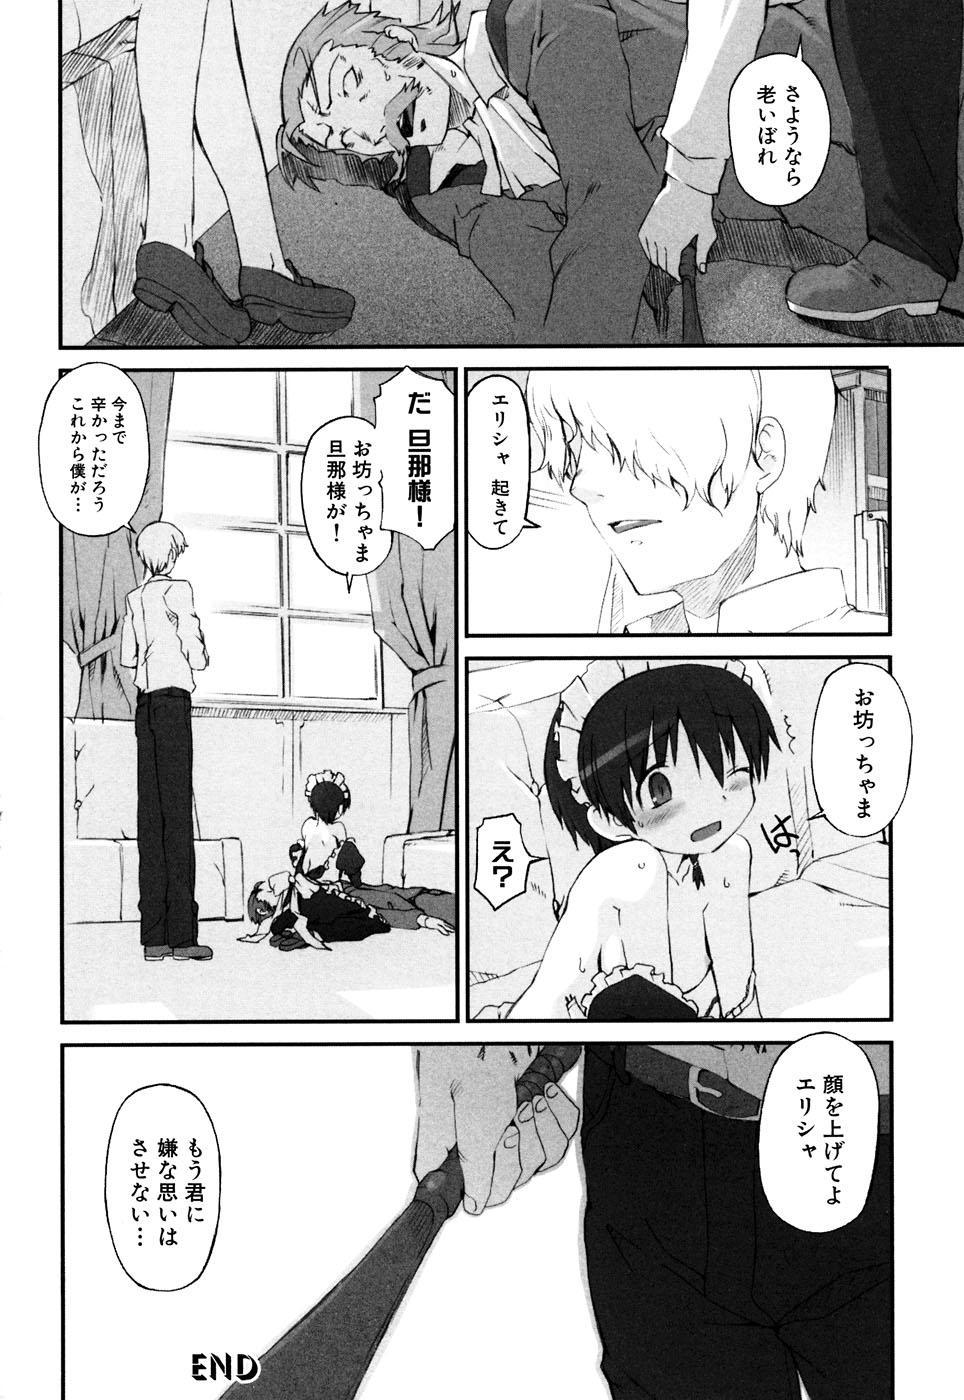 Fechikko VS Series ROUND.2 Miko San VS Maid San 110